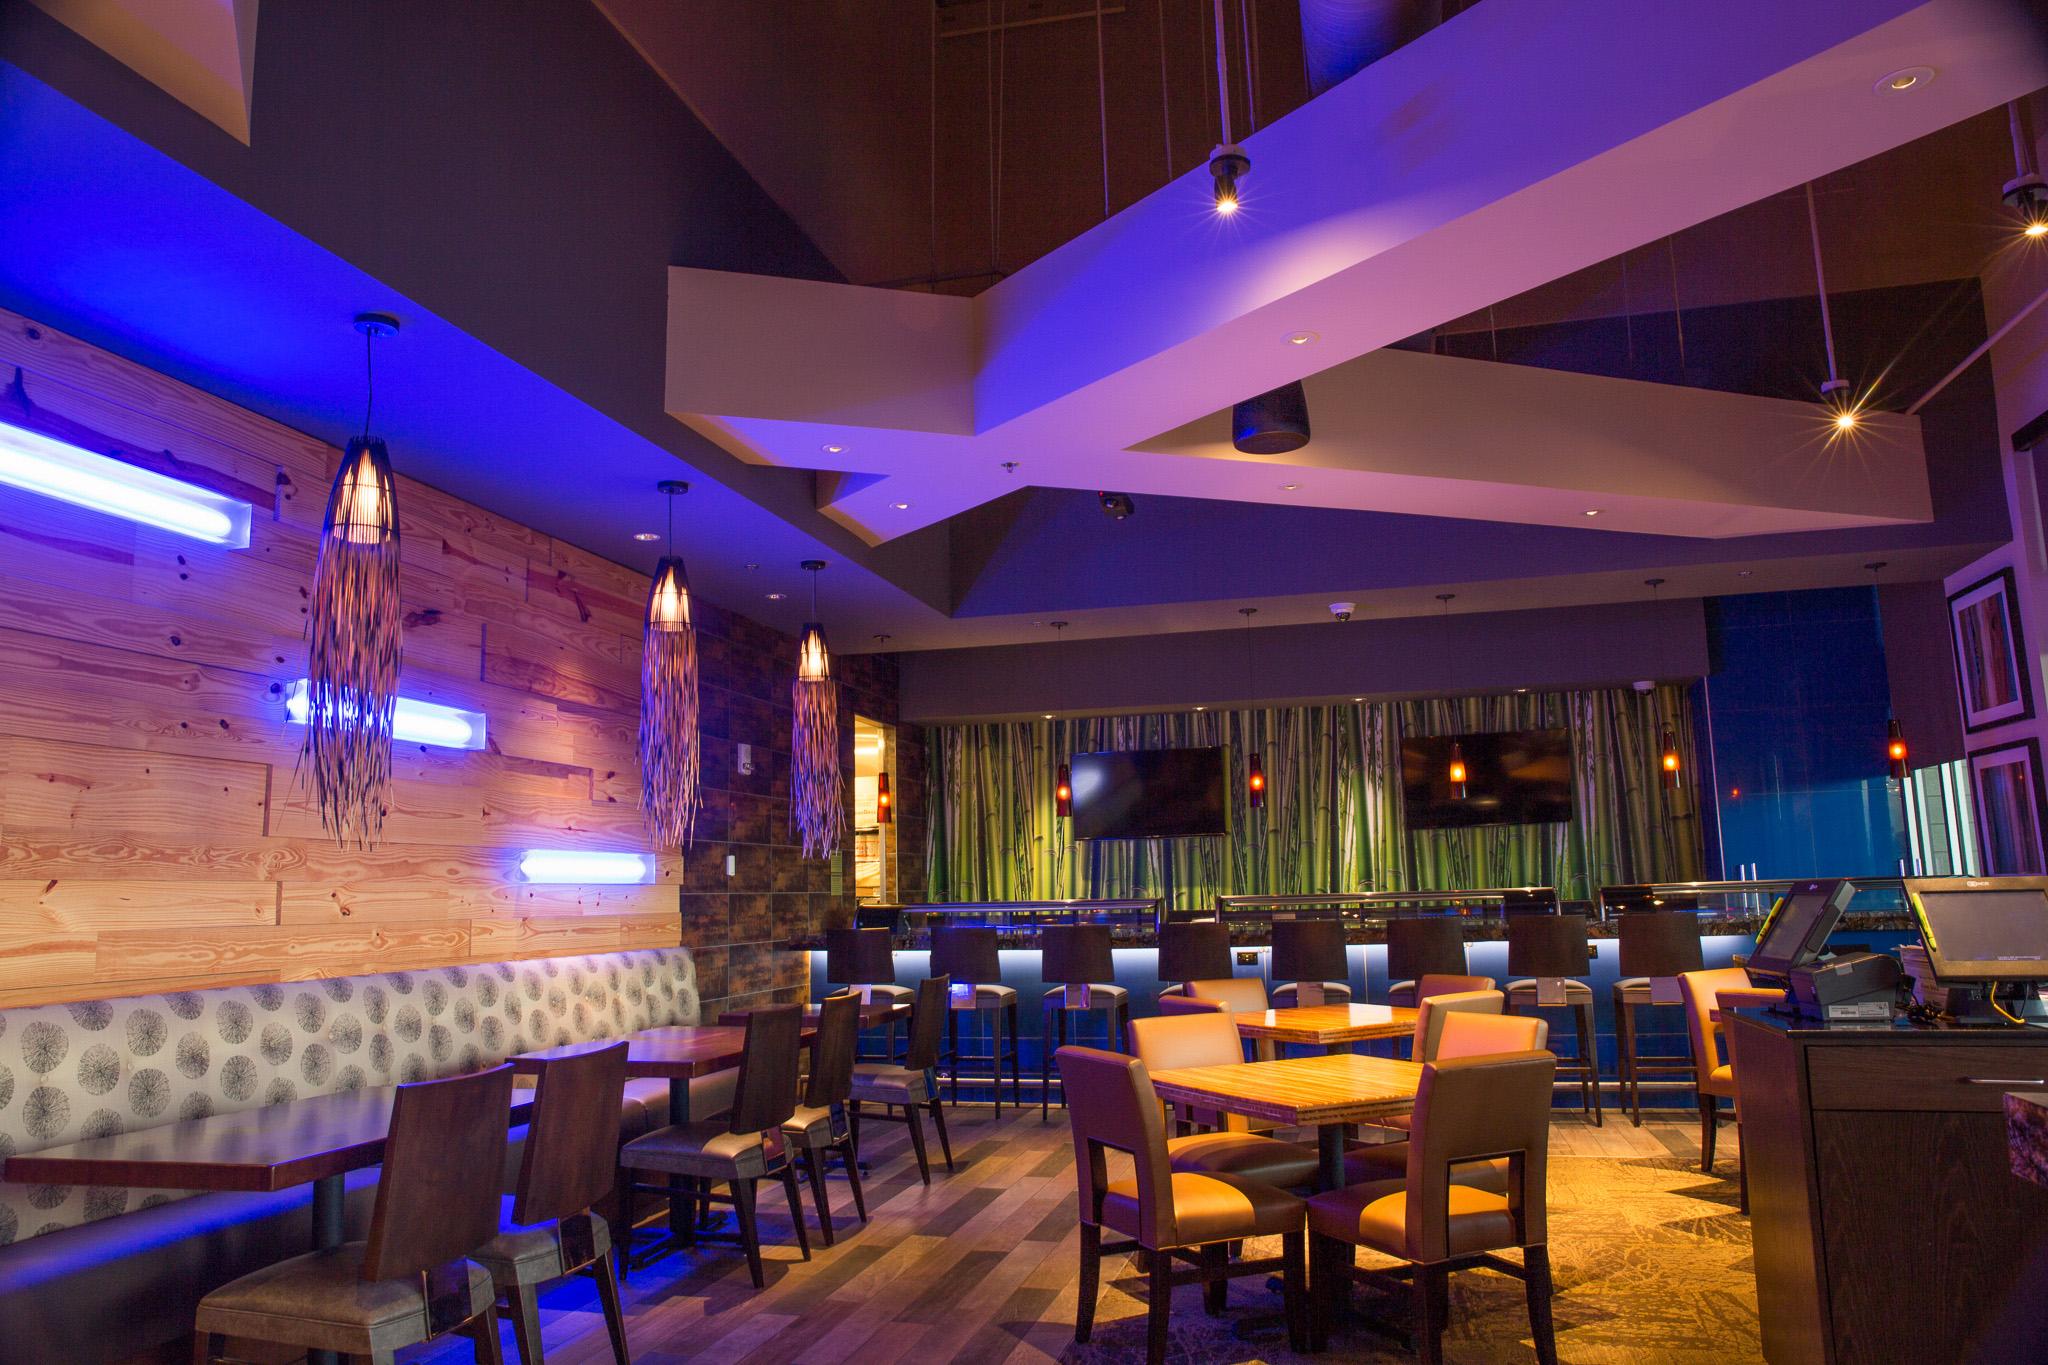 Kona_Grill_Miami_Restaurant_inside